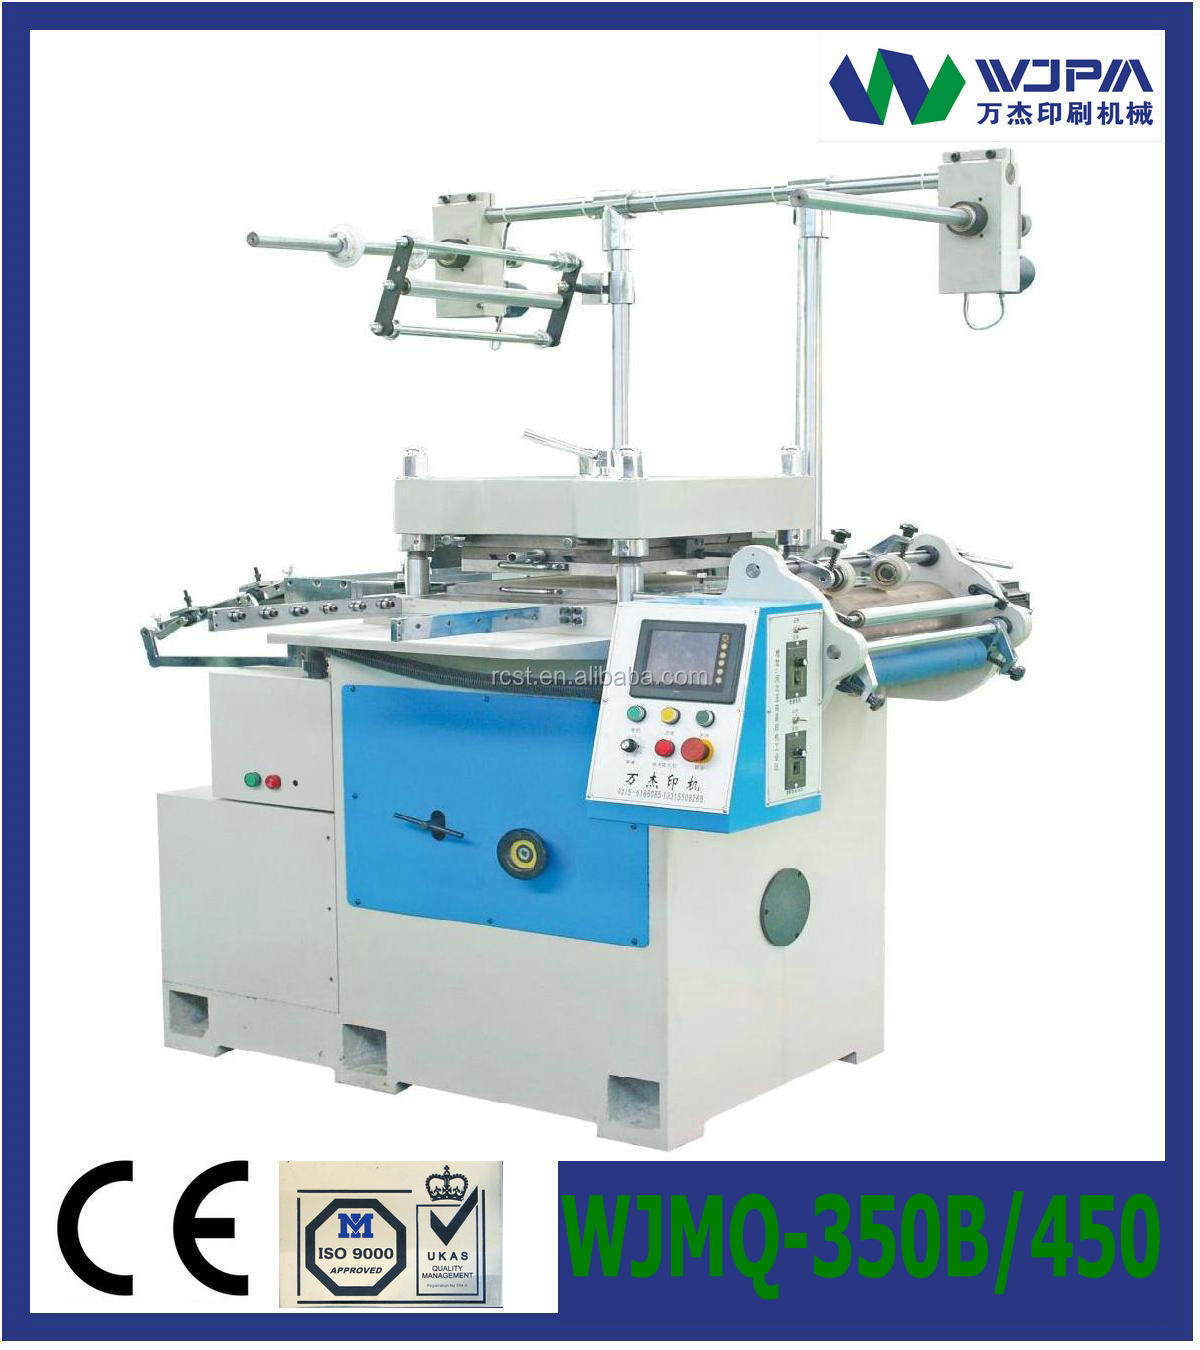 WJMQ450 CNC High Speed Die-cutting Machine.jpg